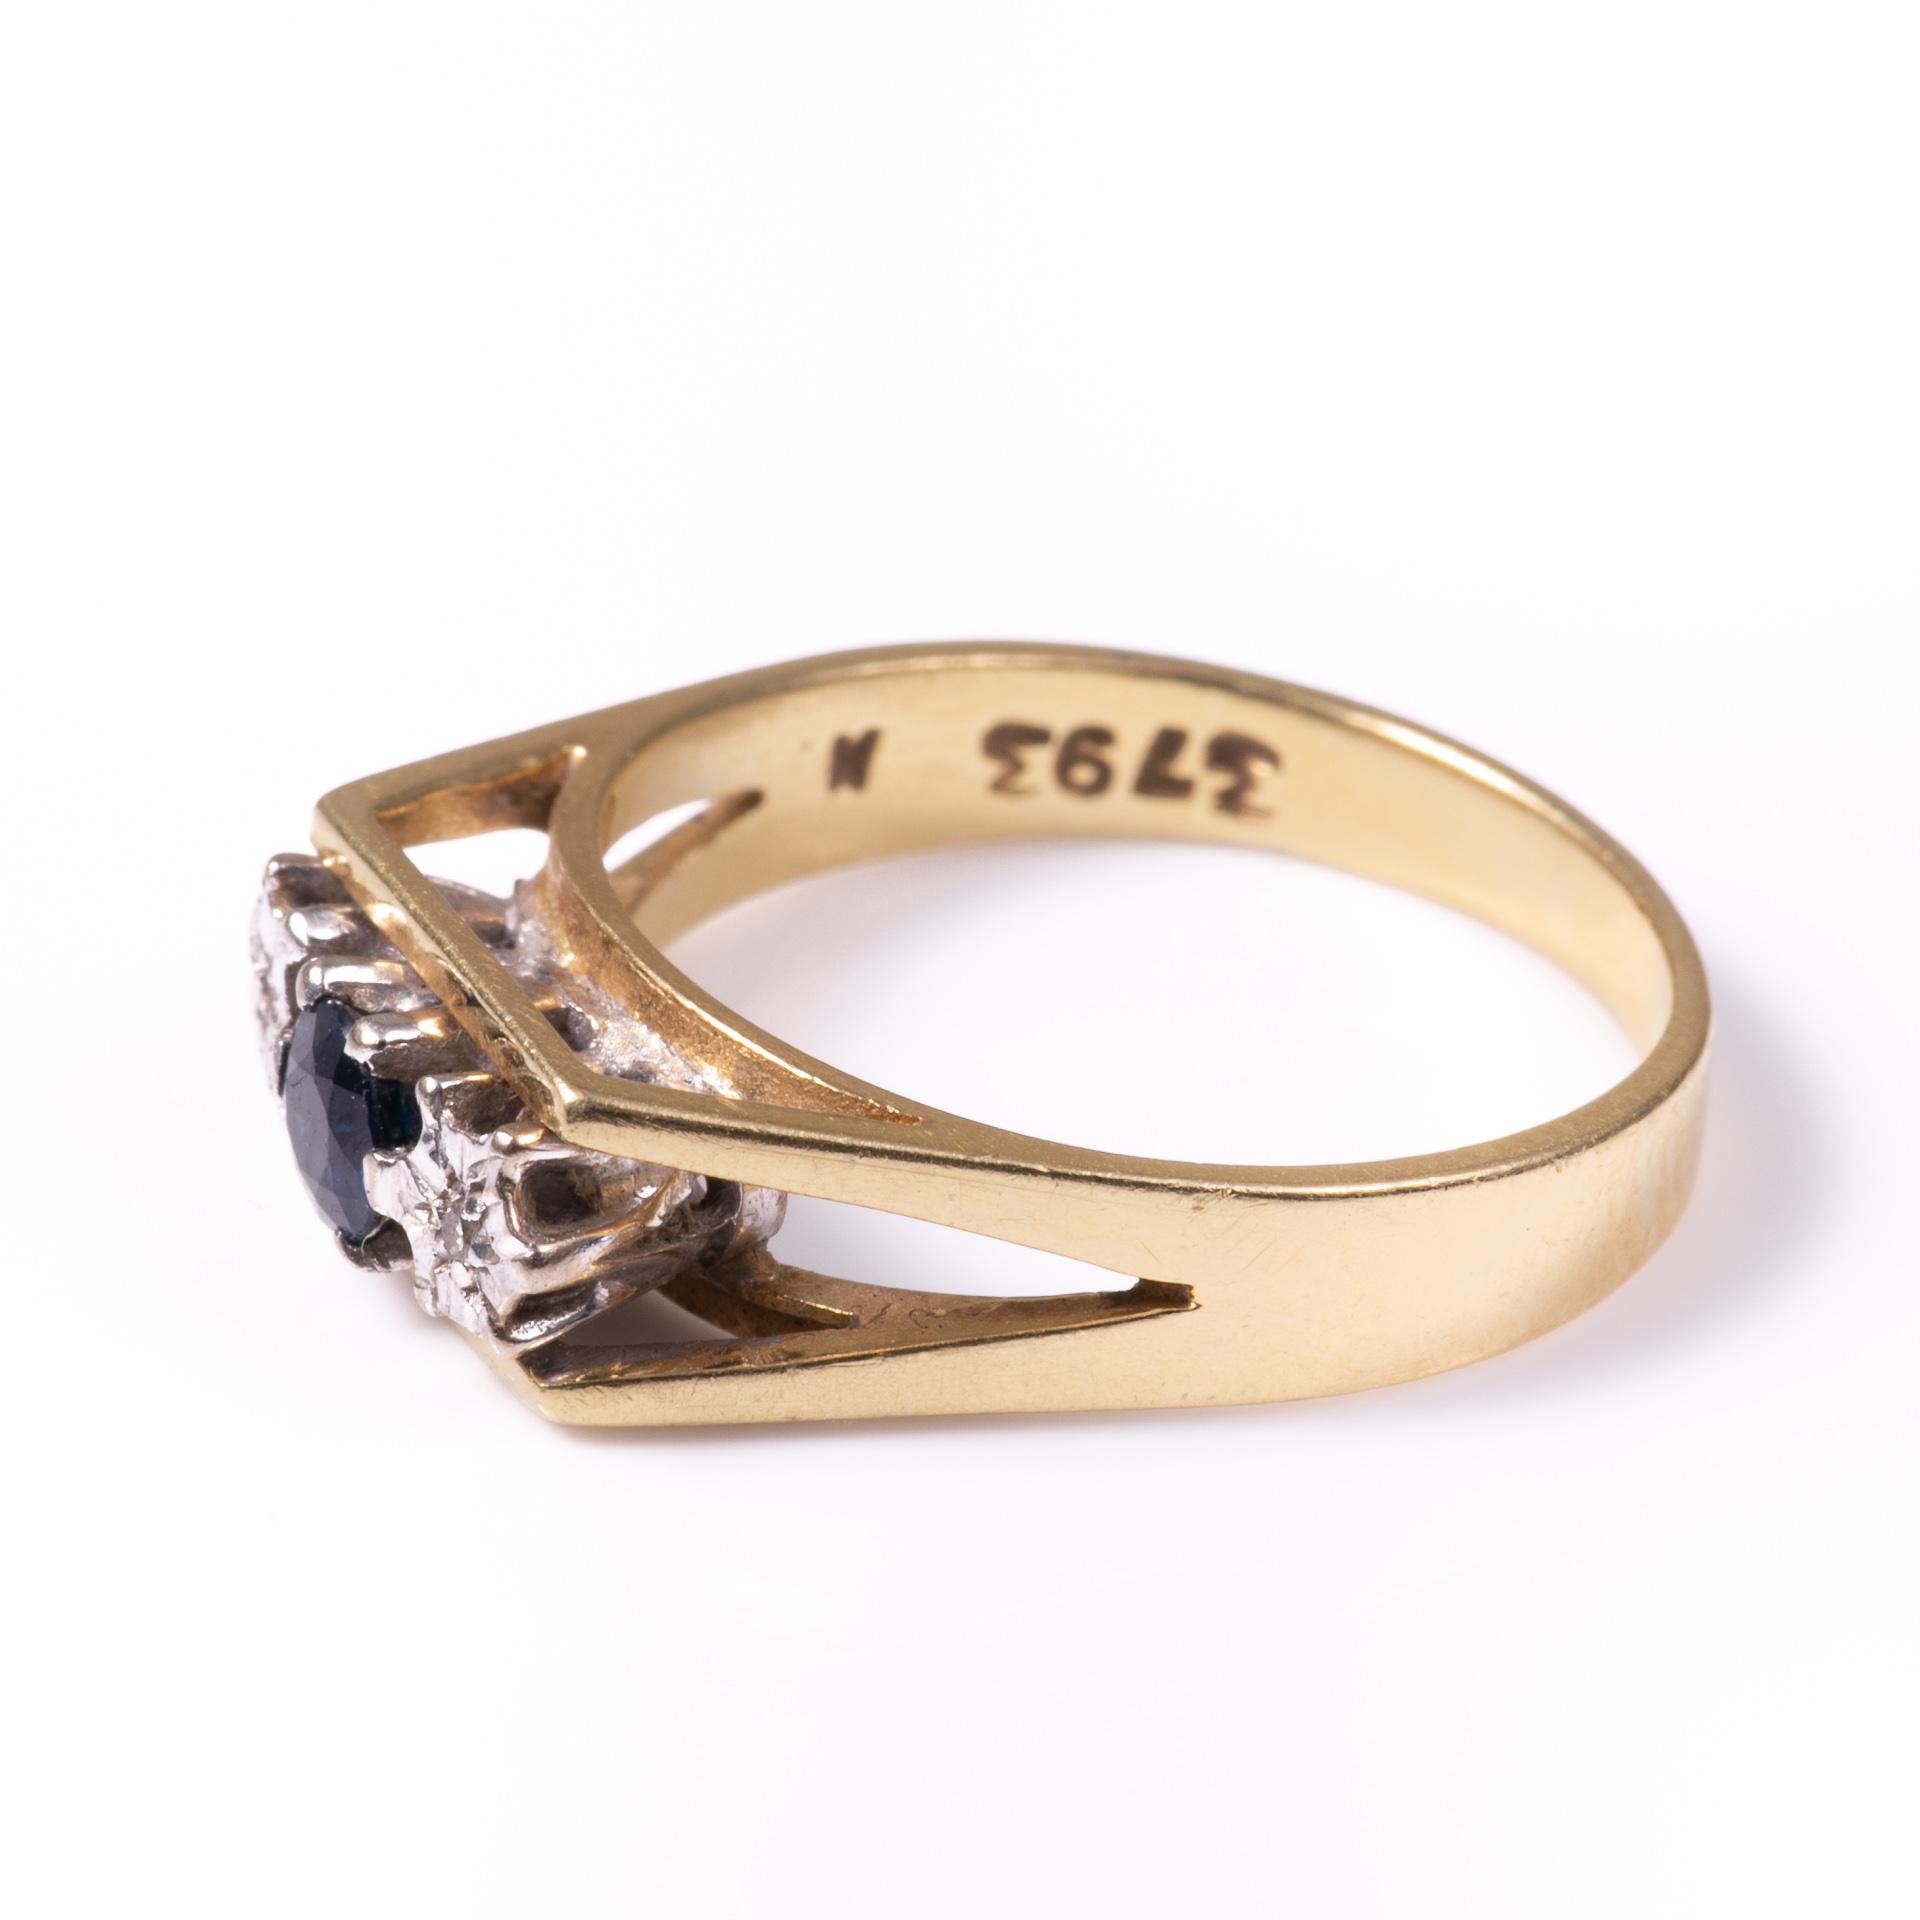 18ct Gold Sapphire & Diamond Ring - Image 3 of 6